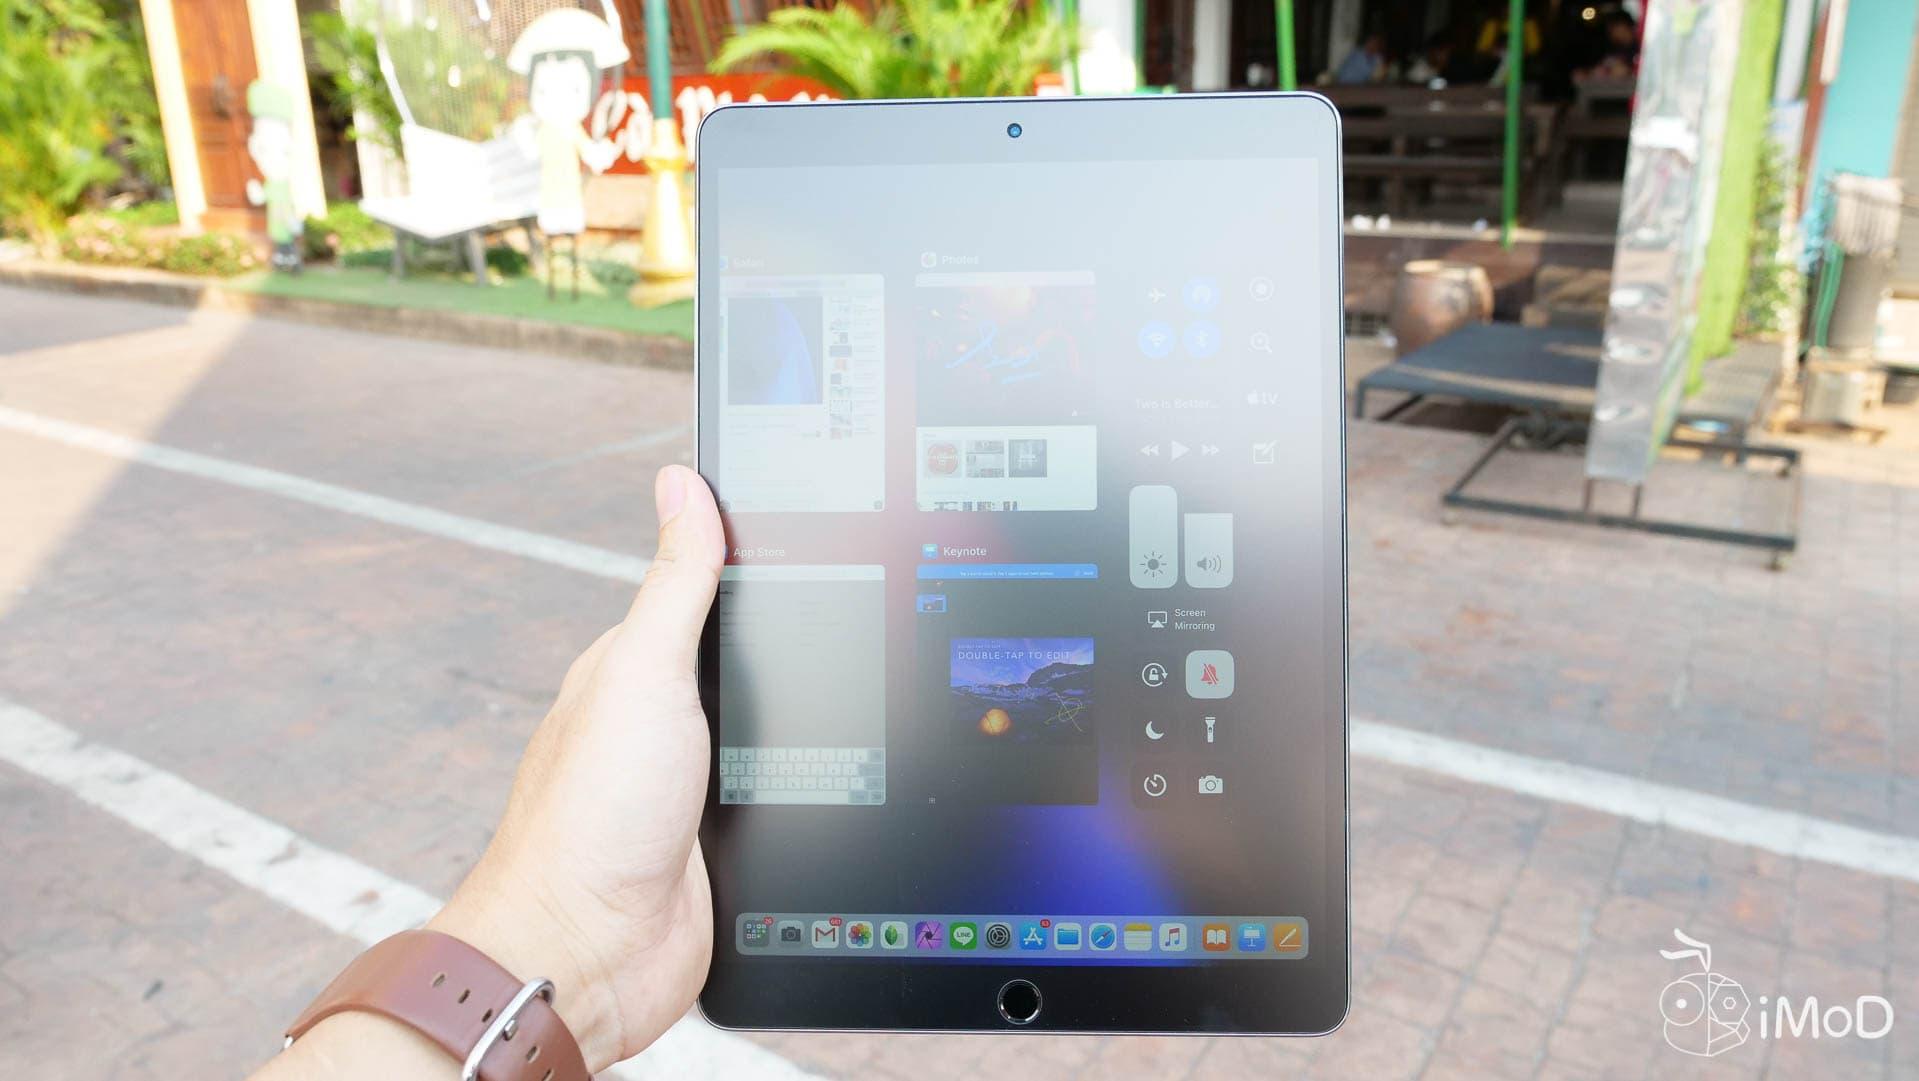 Focus Ipad Pro 10.5 Smart Note 2589